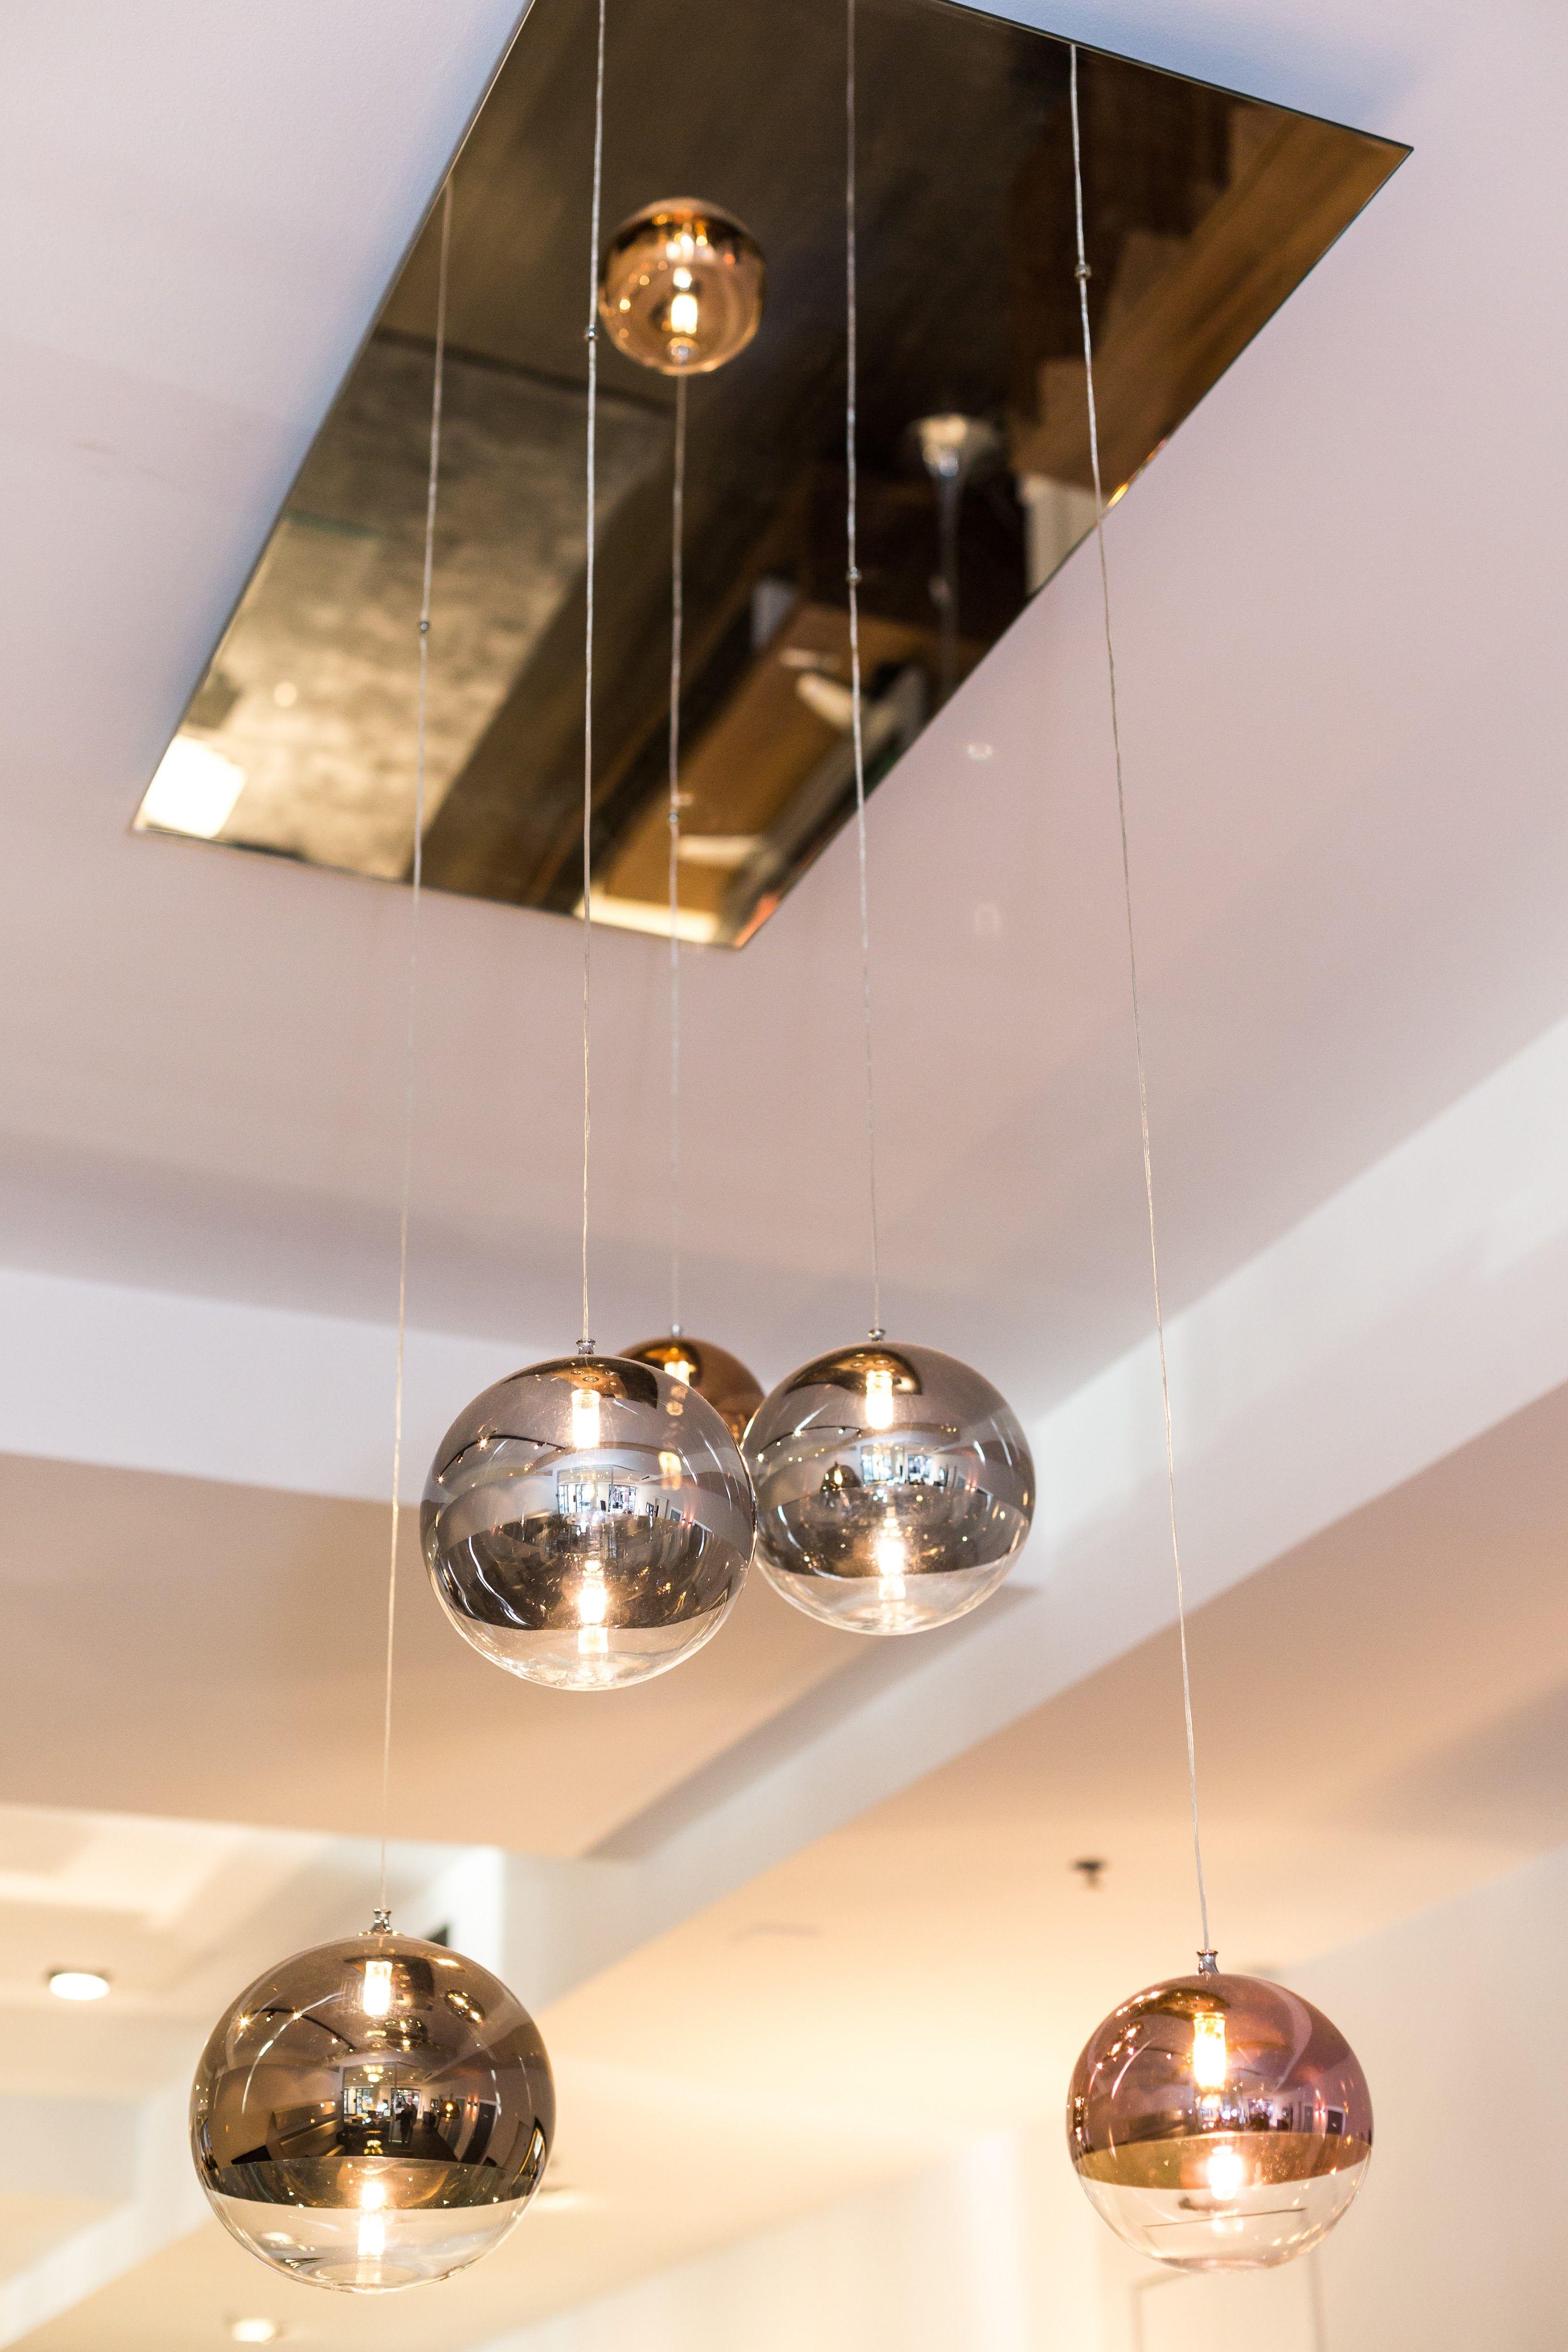 Explore Interior Lighting Murano Glass And More